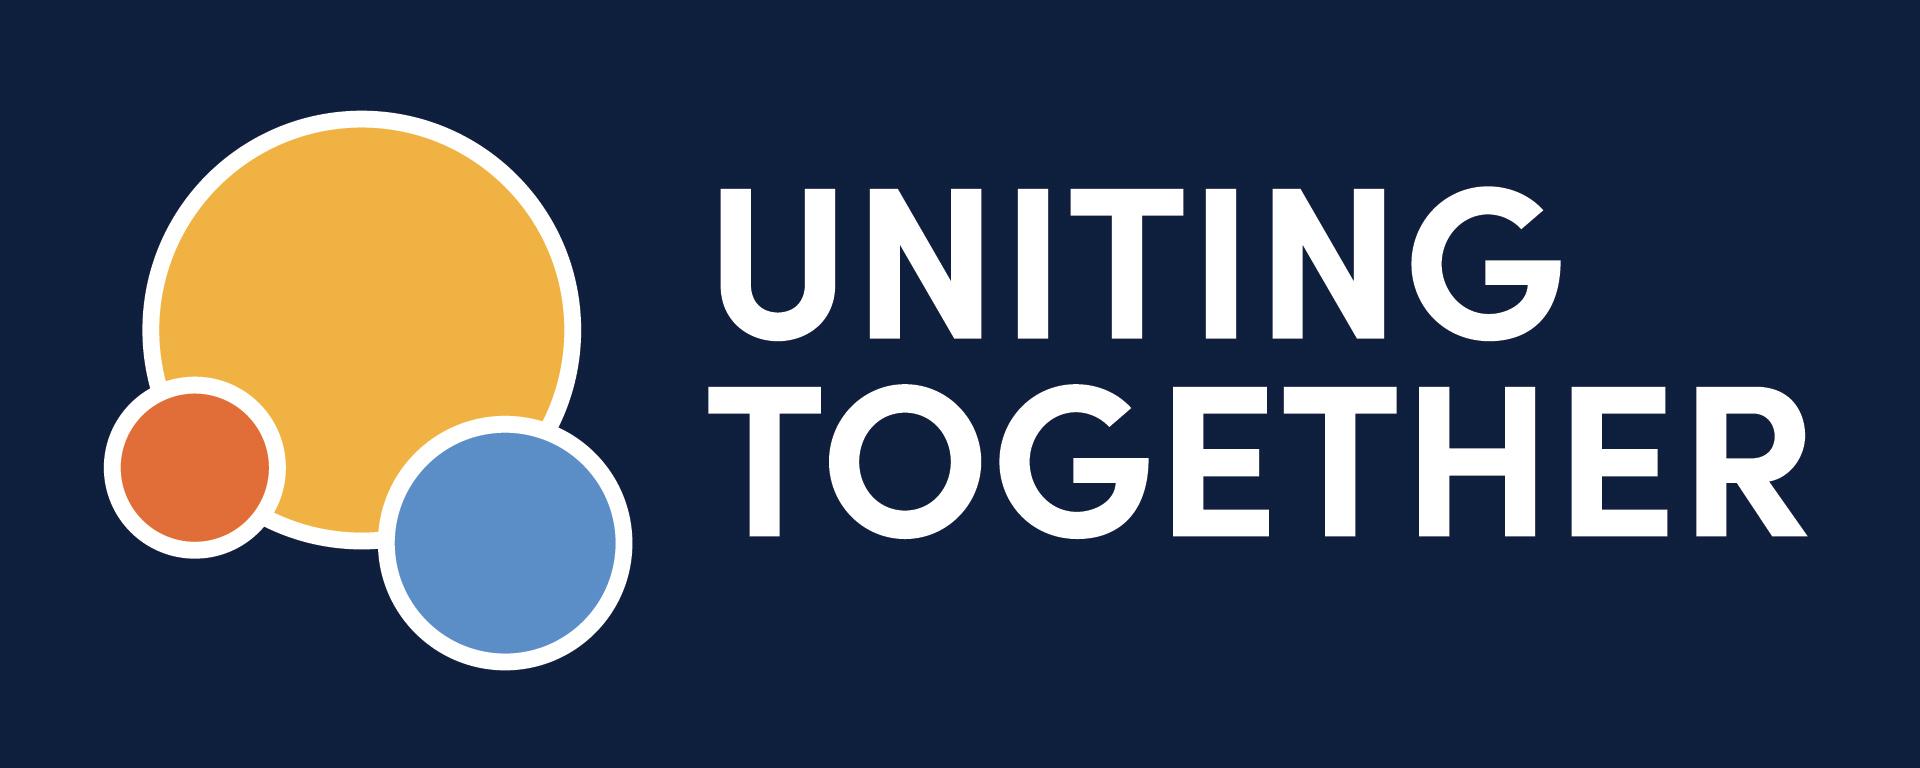 Uniting Together